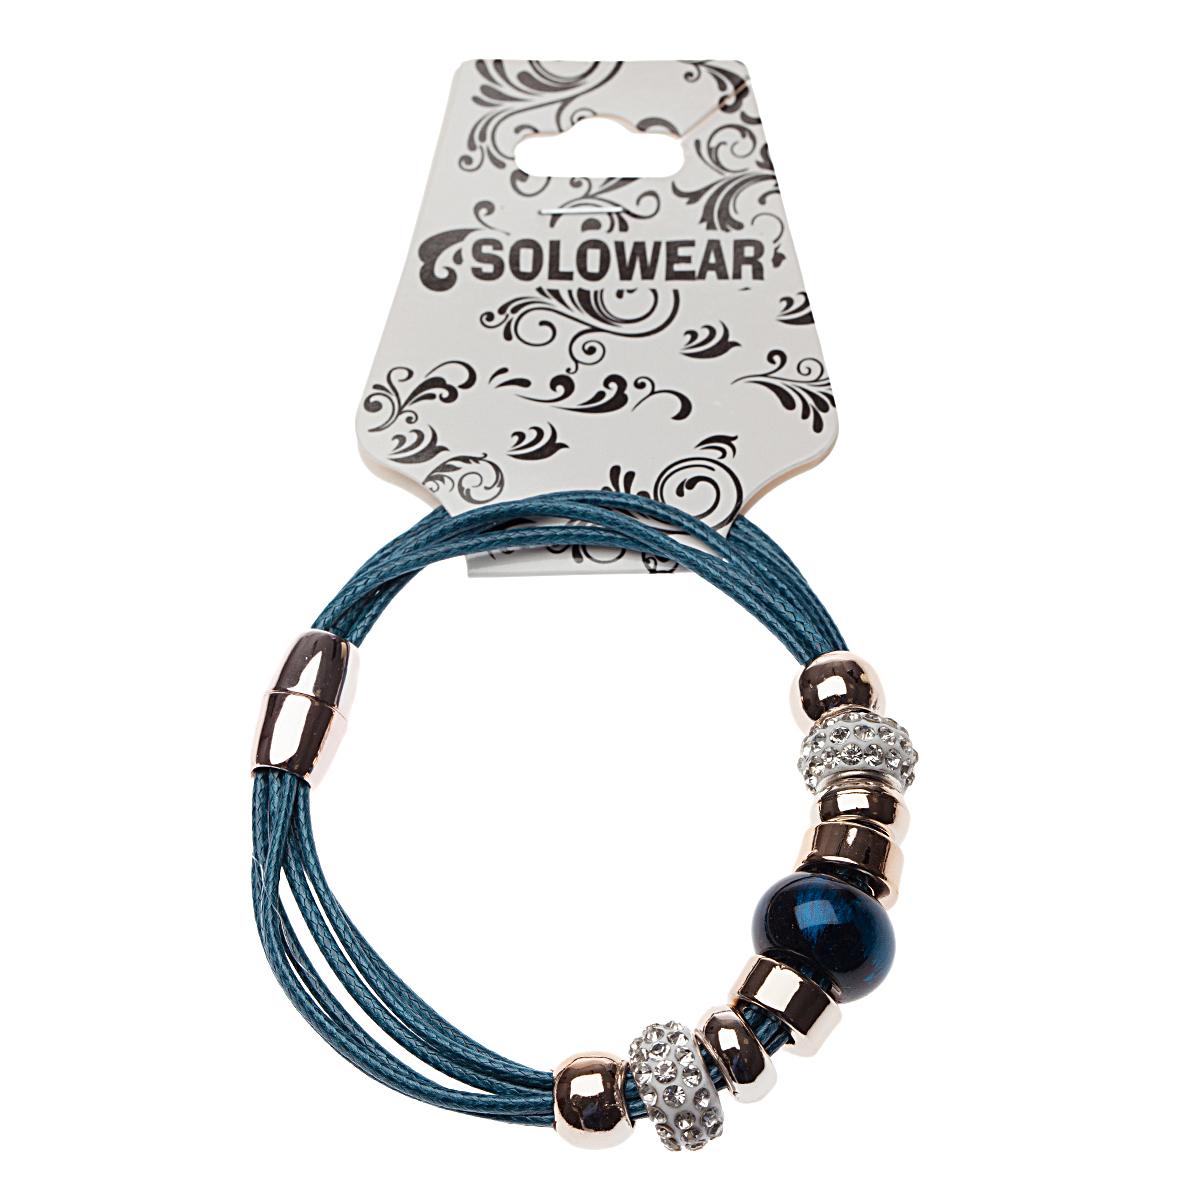 Браслет Solowear, 4620-9 браслет solowear 4620 7